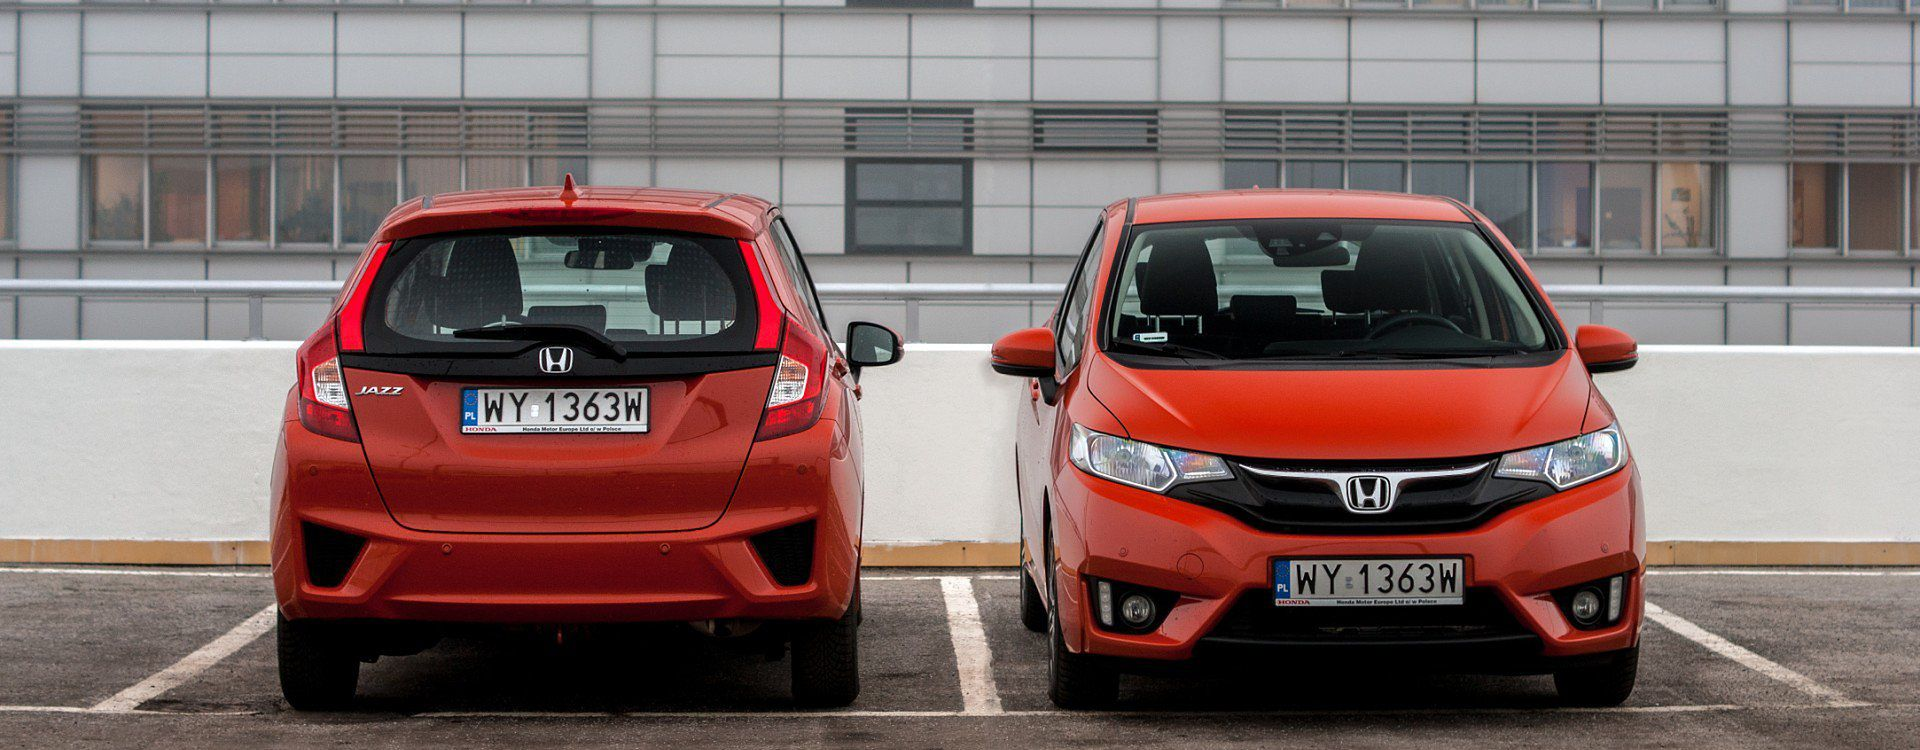 Honda jazz 1 3 i vtec comfort test opinia spalanie cena